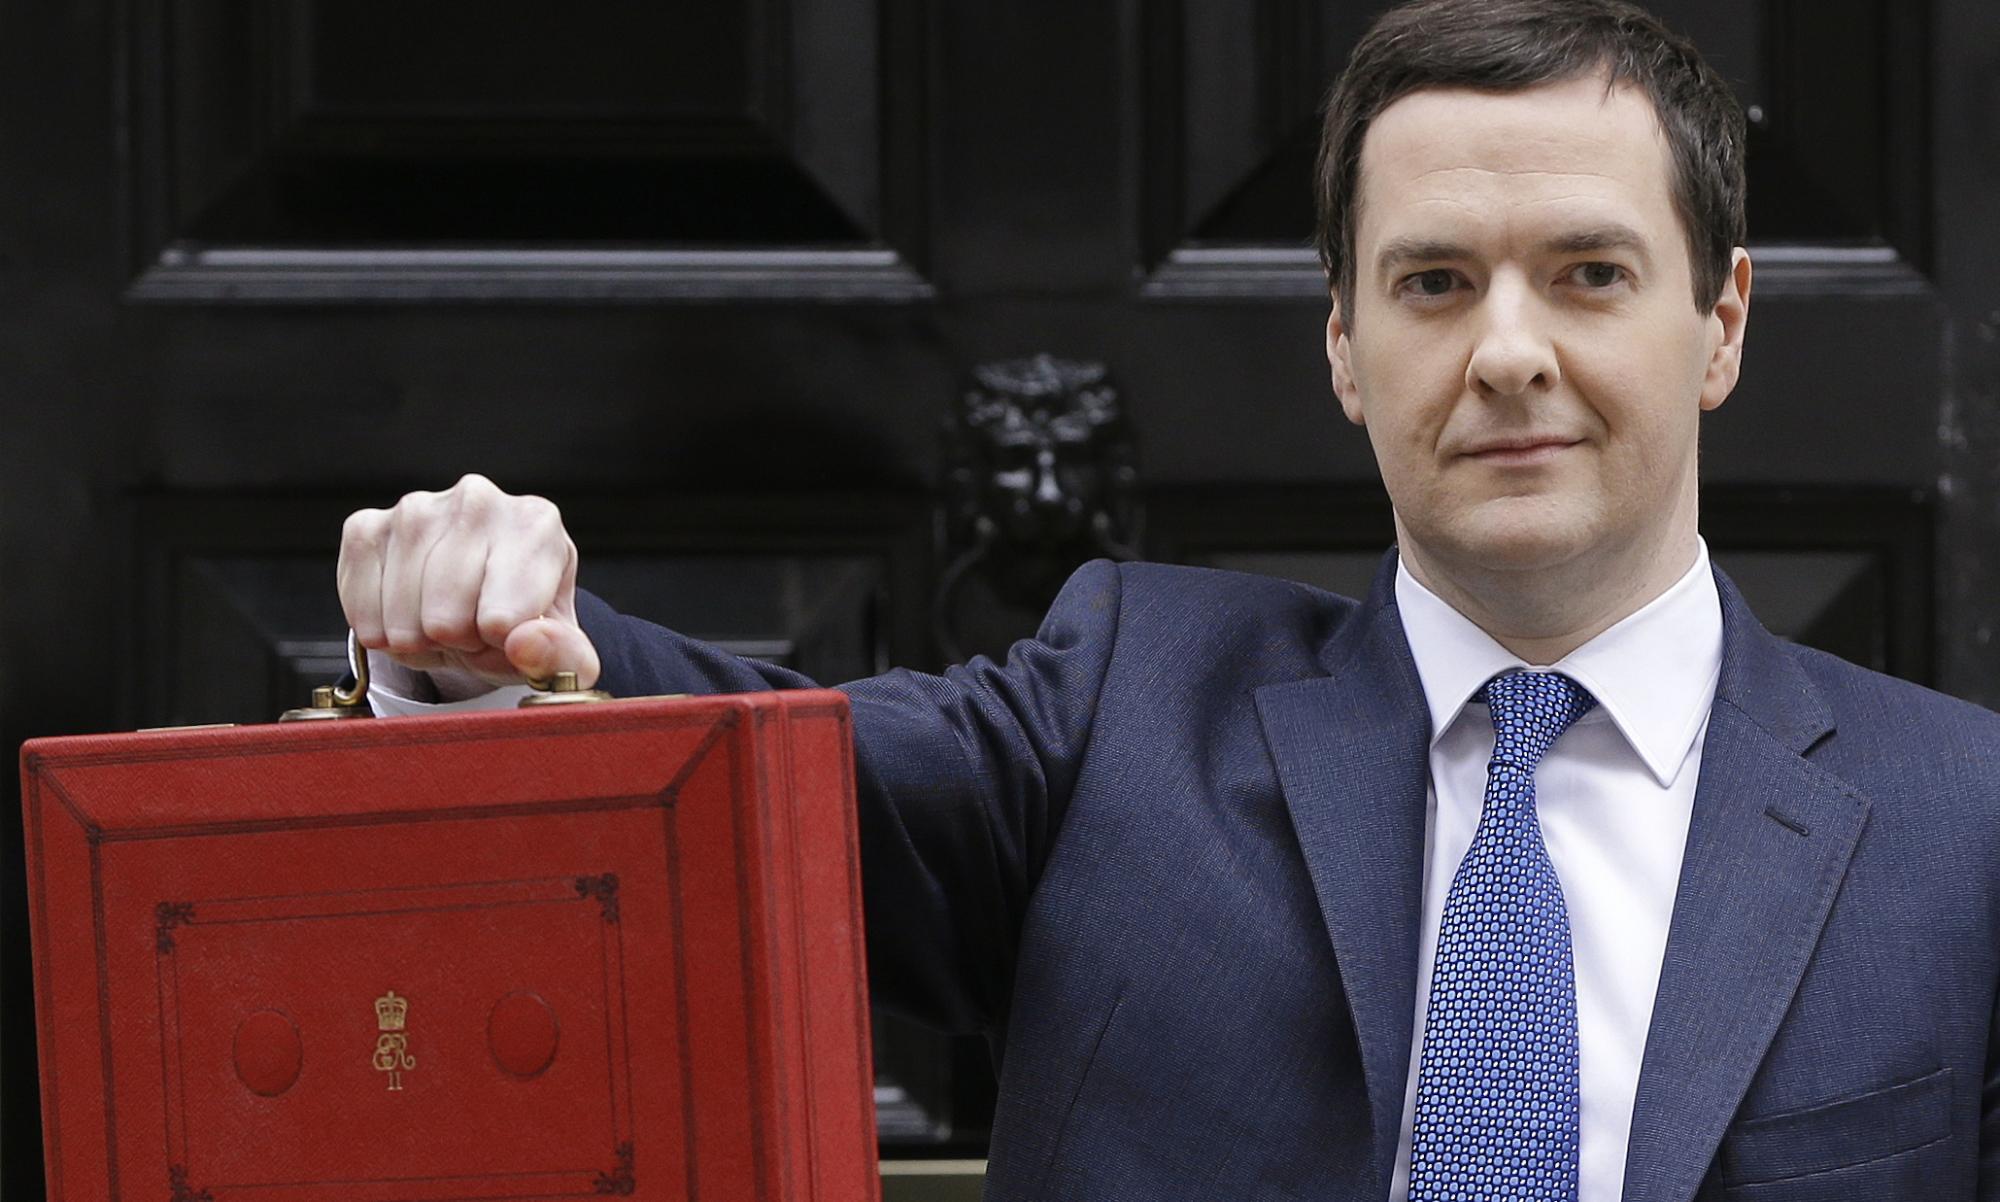 Osborne pins hopes on £6bn budget windfall to regain momentum in polls